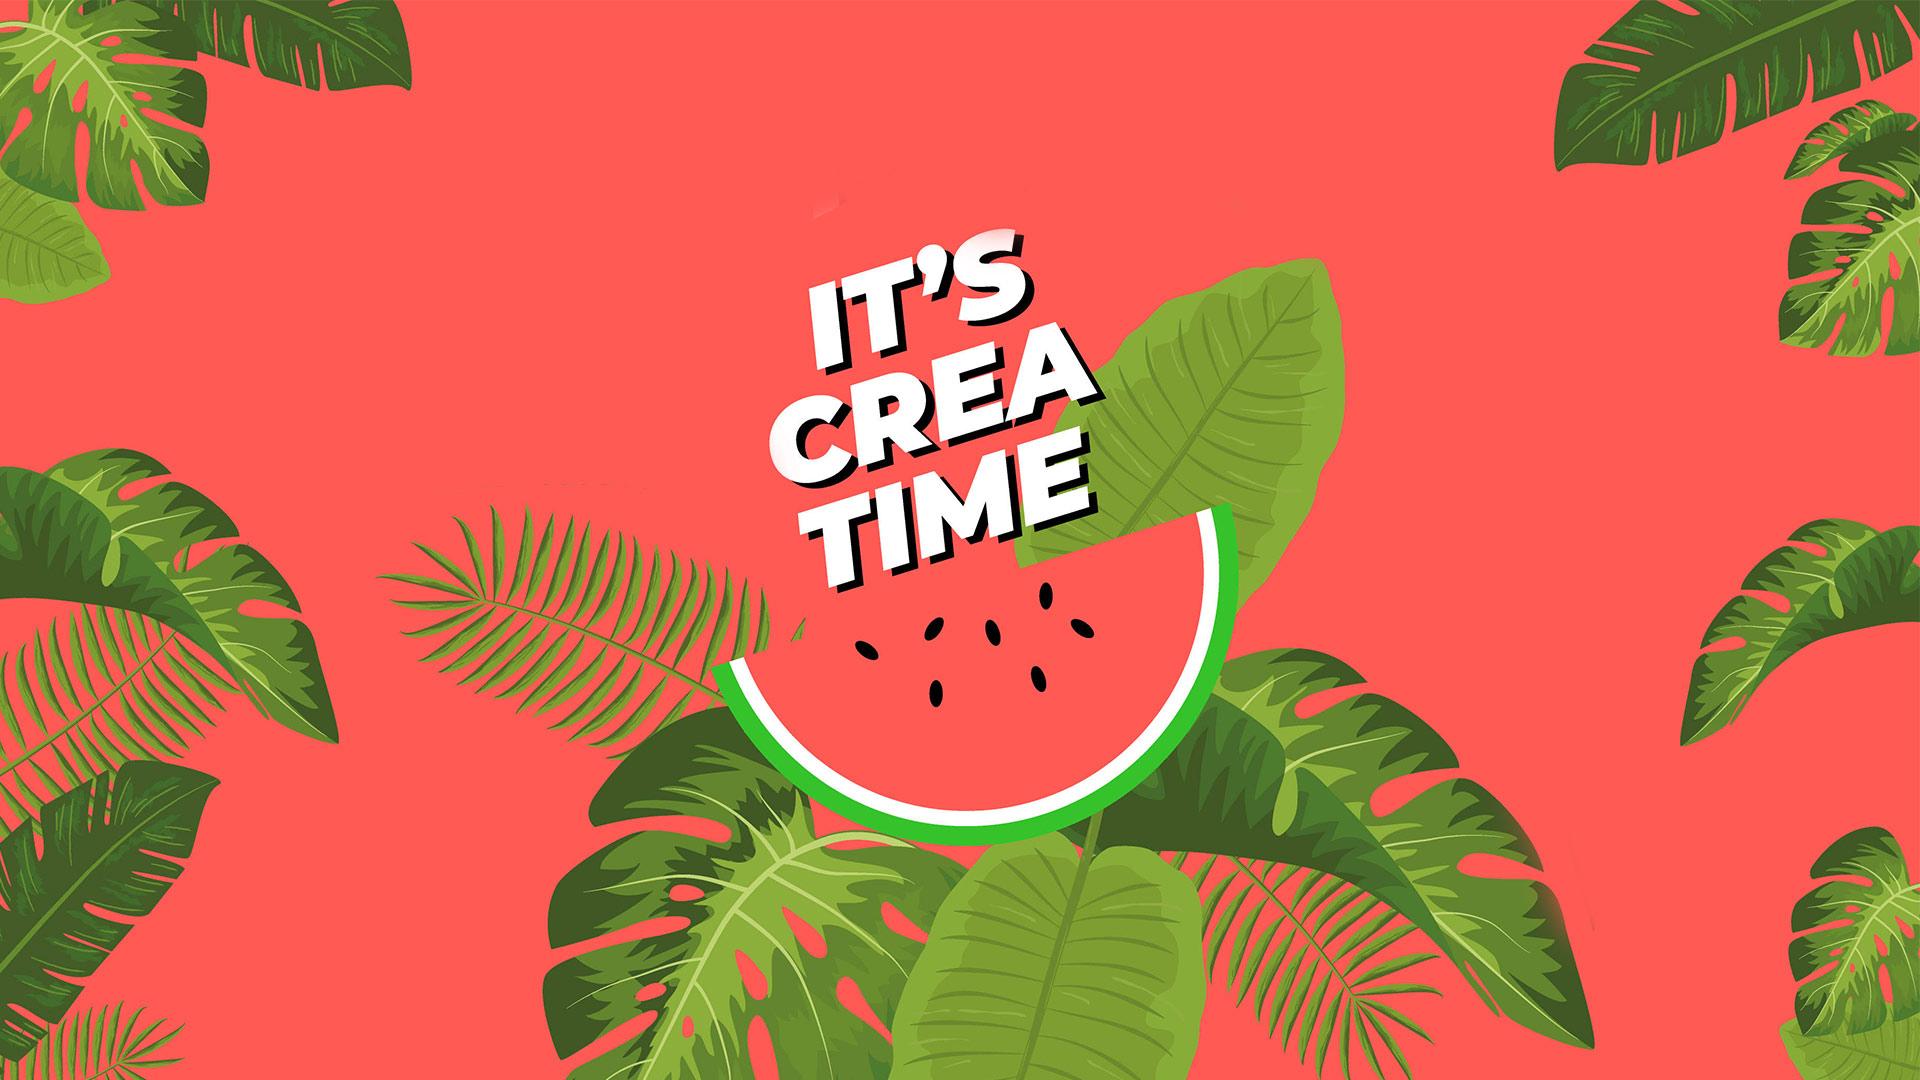 crea_time_event_illustration